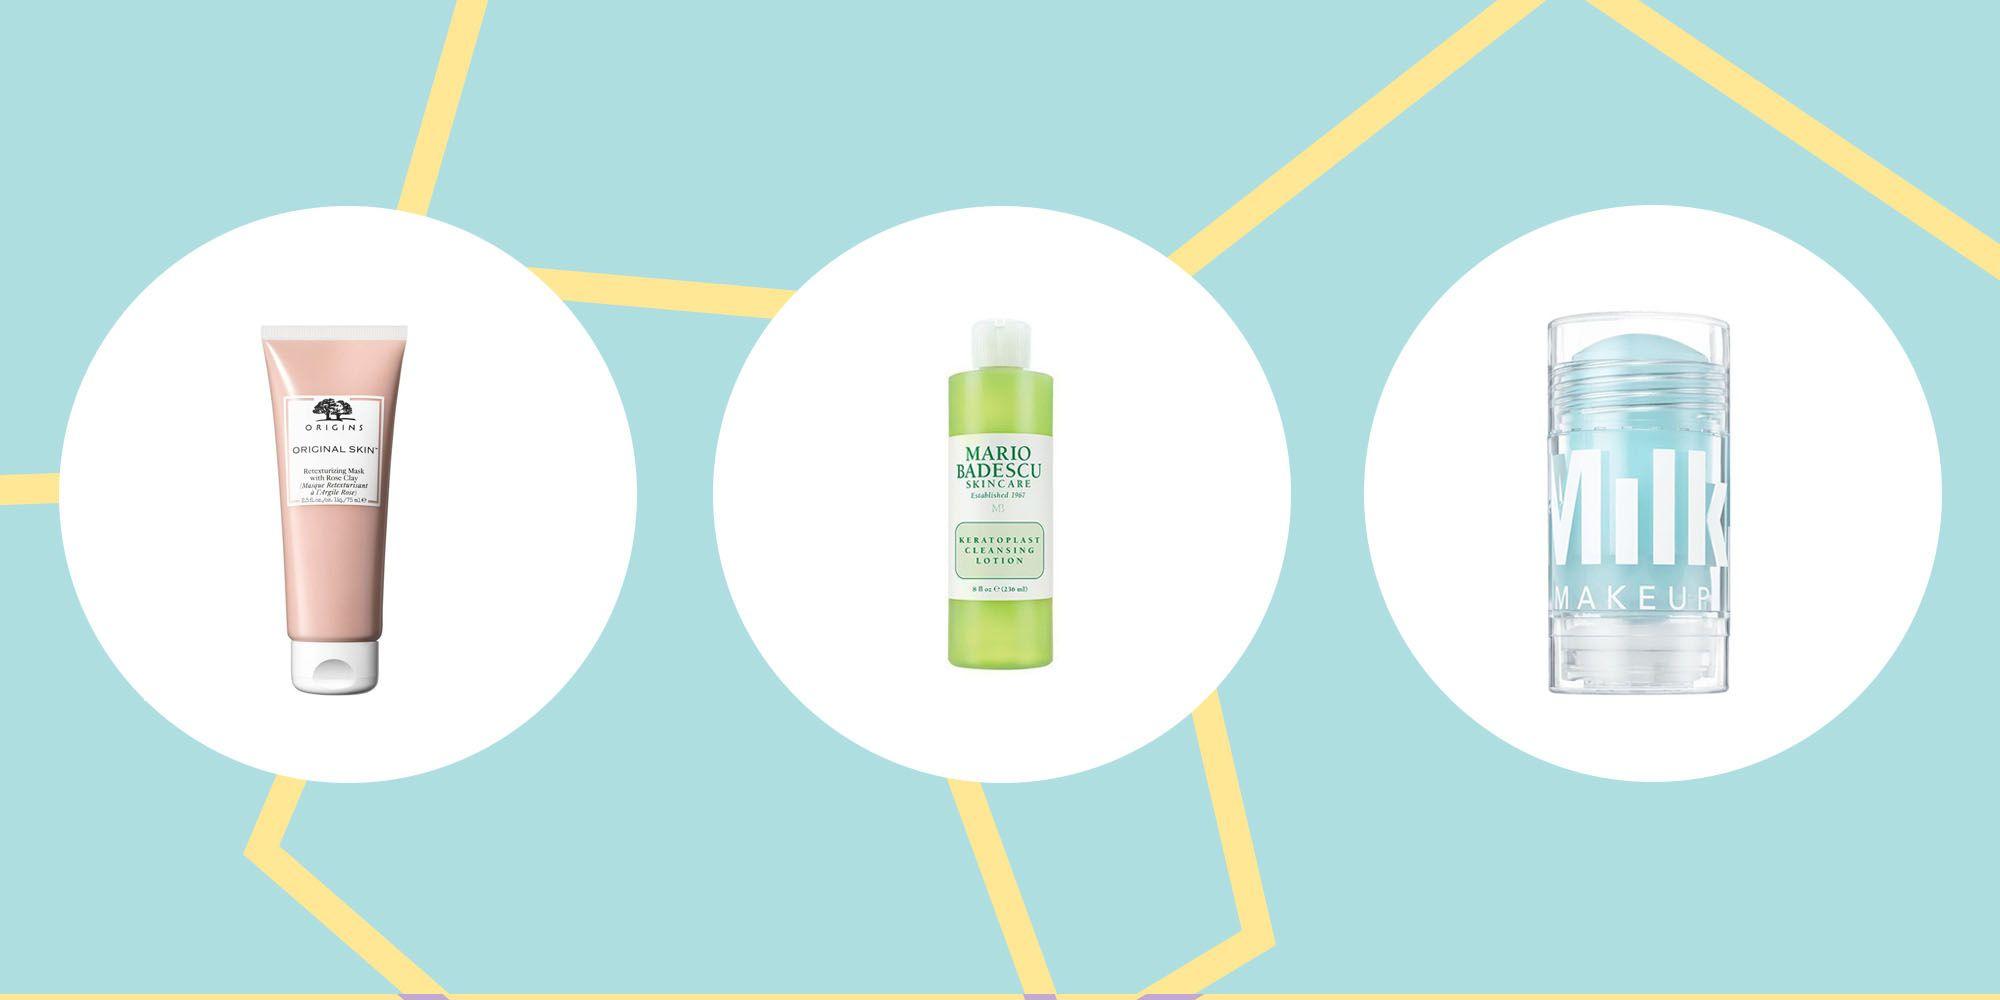 rosacea products - women's health uk